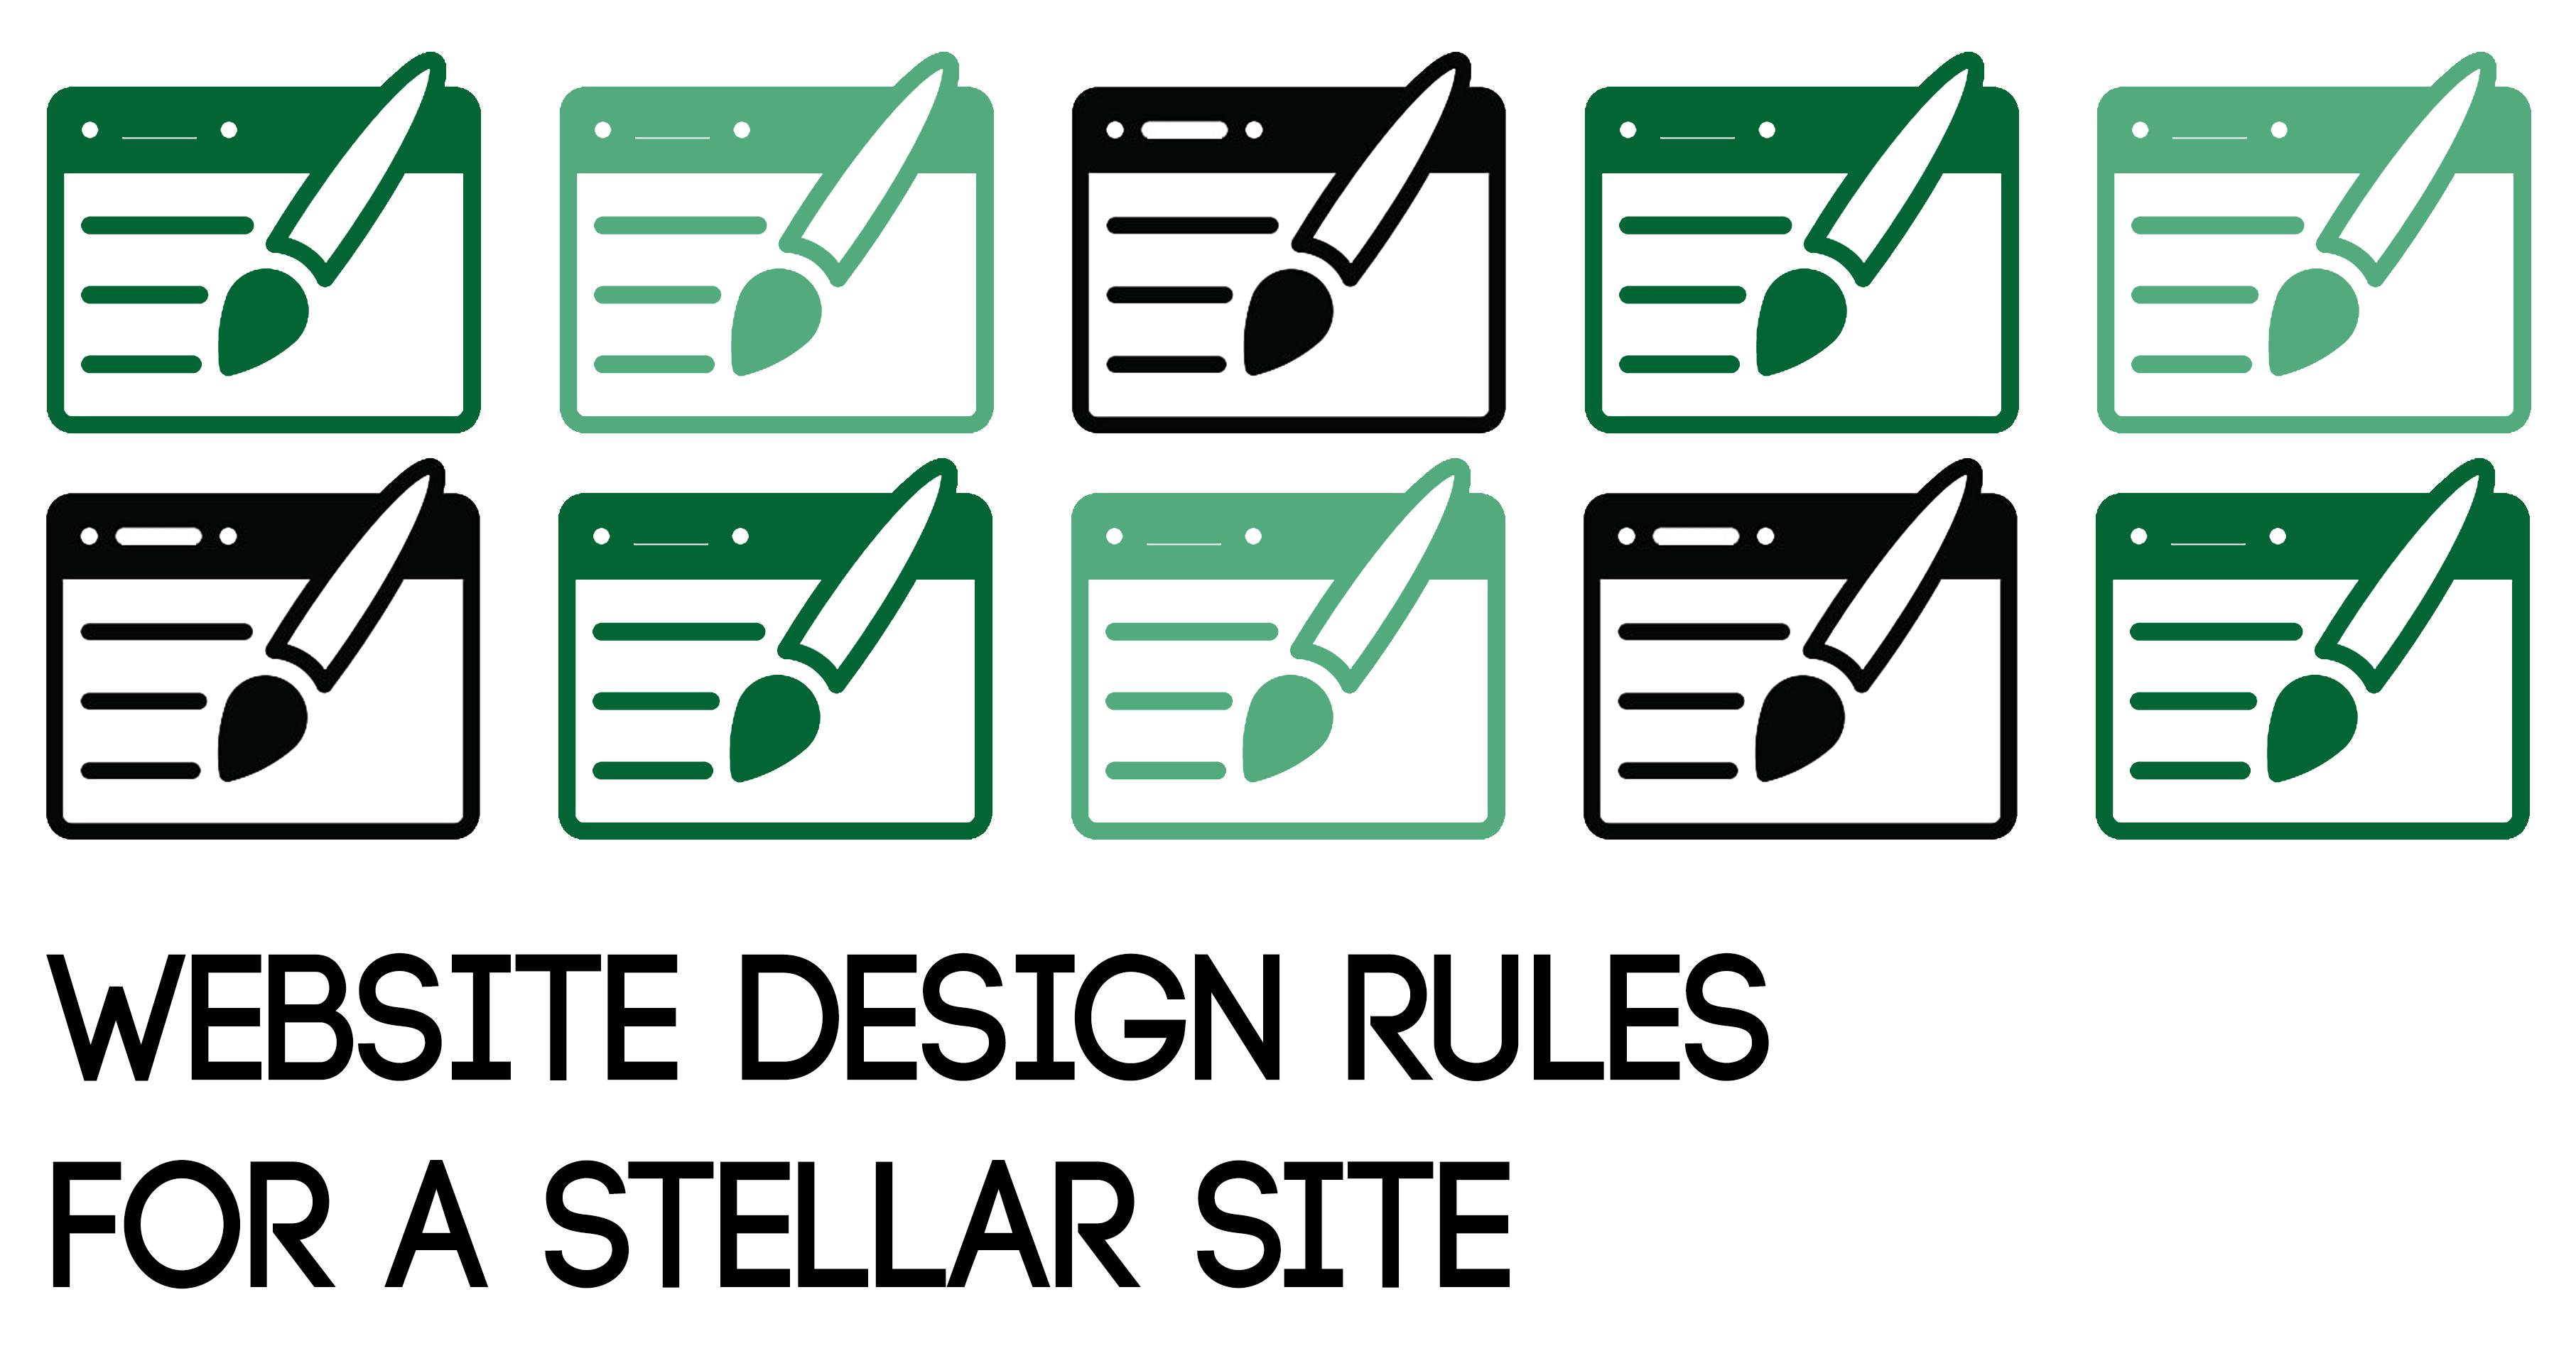 Website Design Rules for a Stellar Site